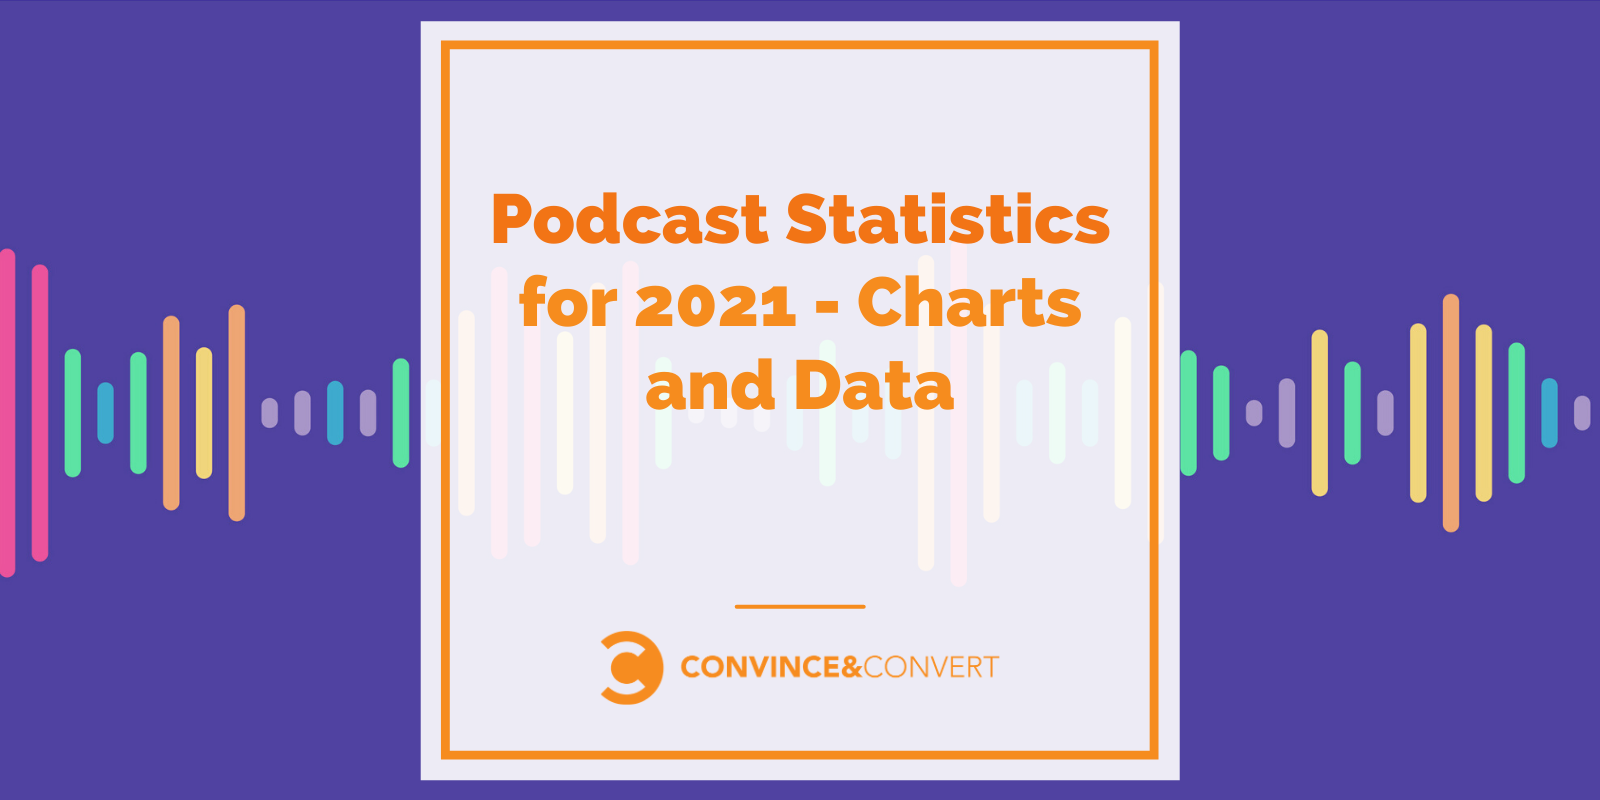 Podcast Statistics for 2021